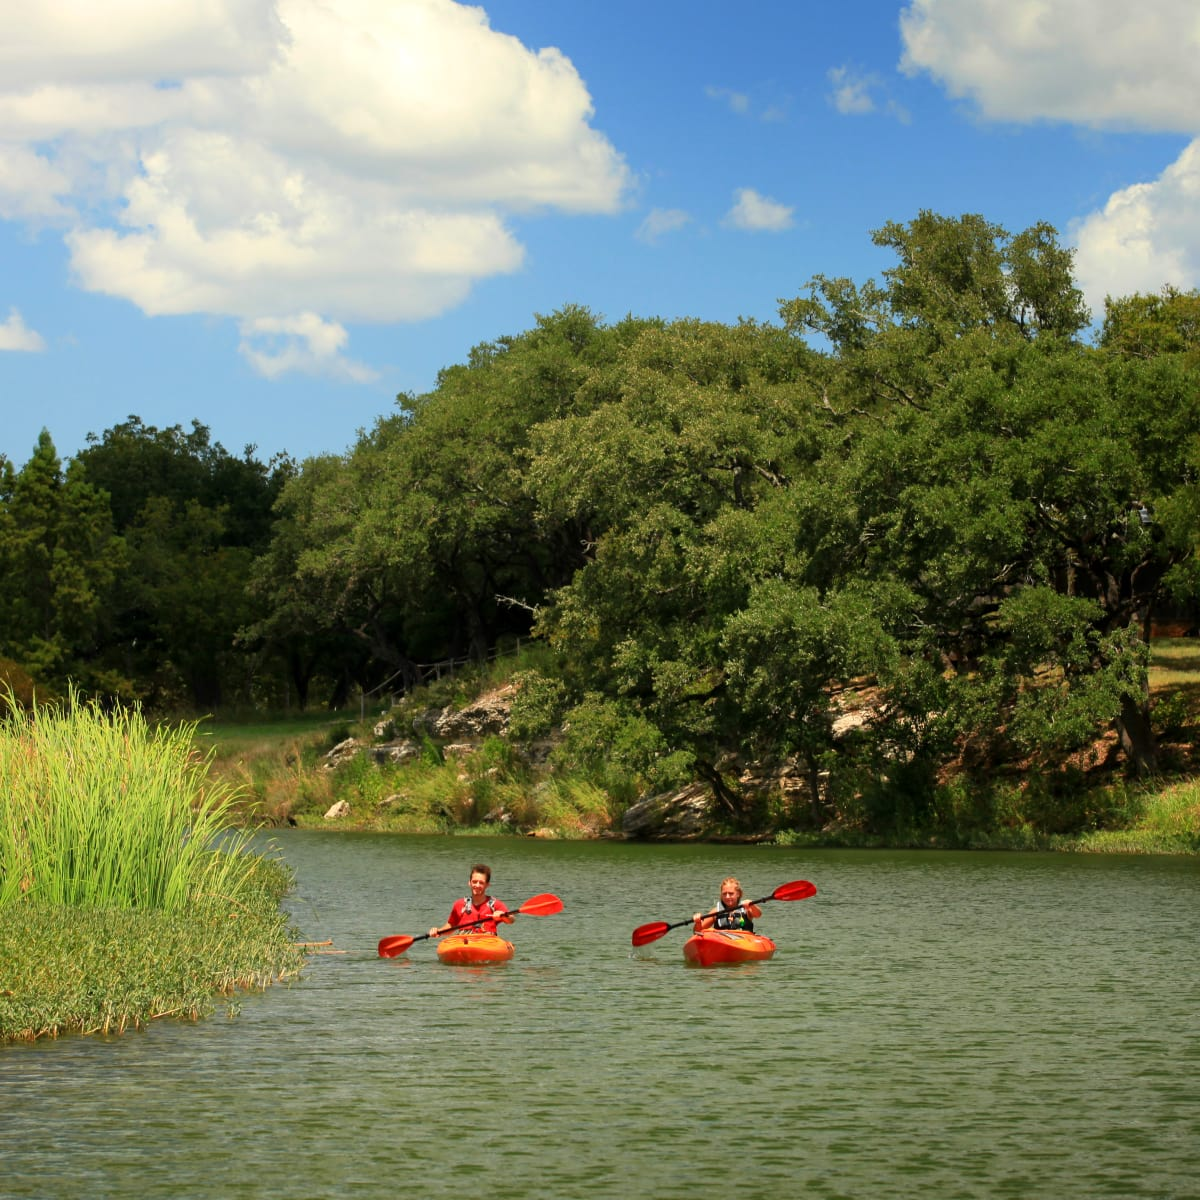 Onion Creek kayakers